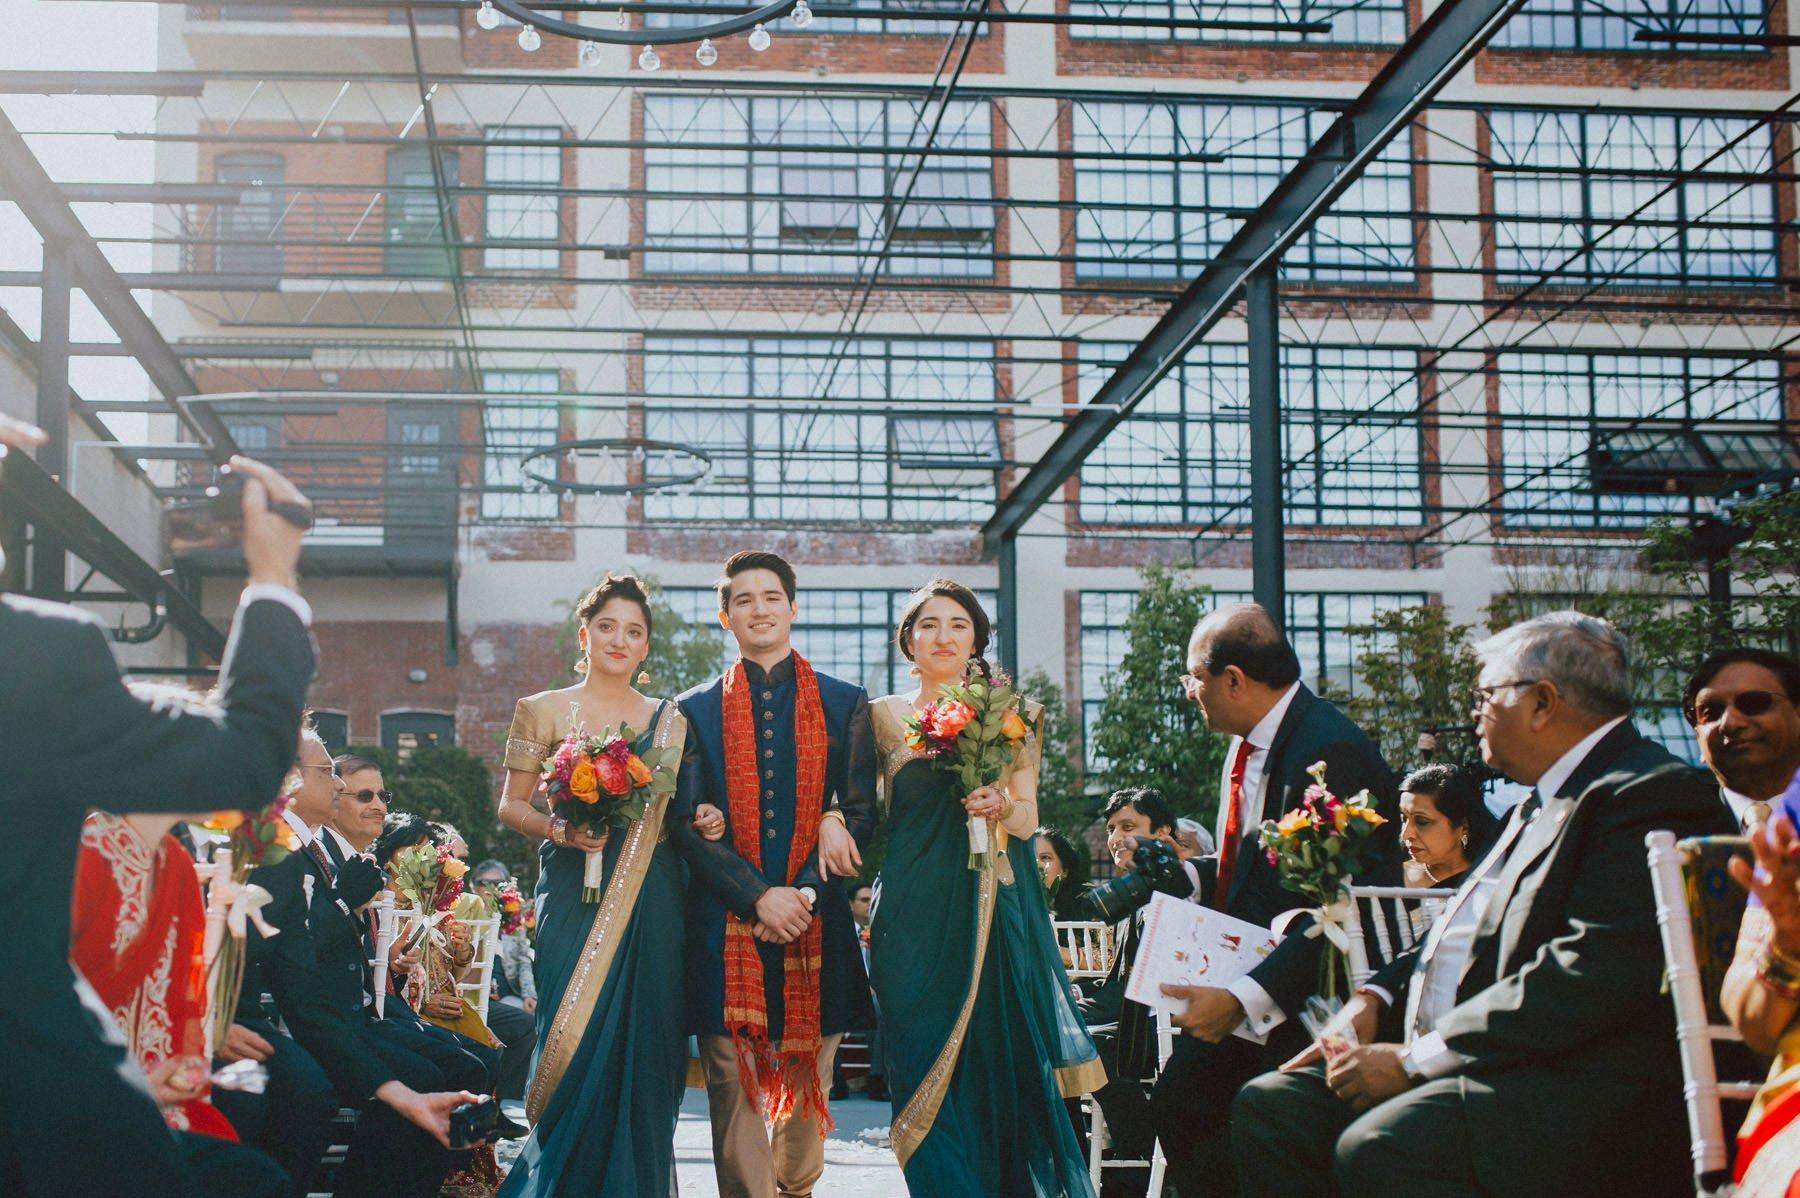 vie-philadelphia-indian-wedding-73.jpg